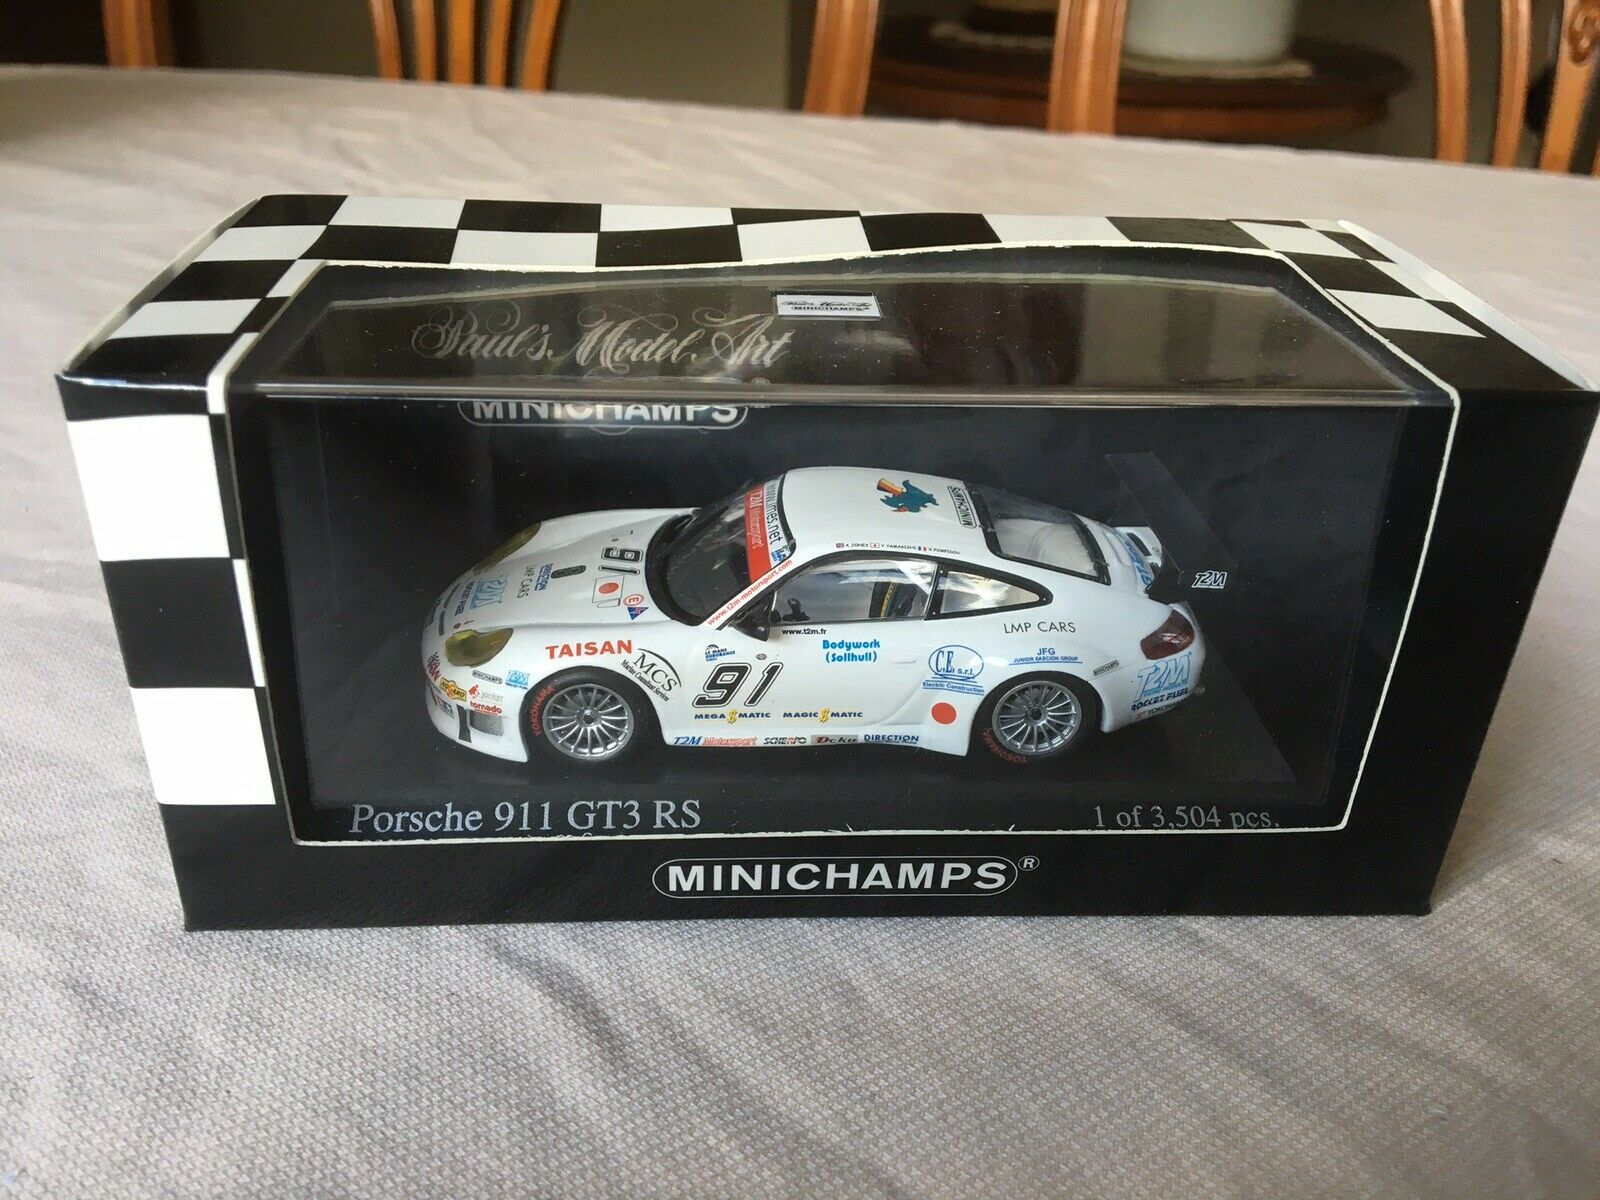 Minichamps Porsche 911 GT3 RS. 1000km Spa 2005.   T2M. In 1 43 scale diecast